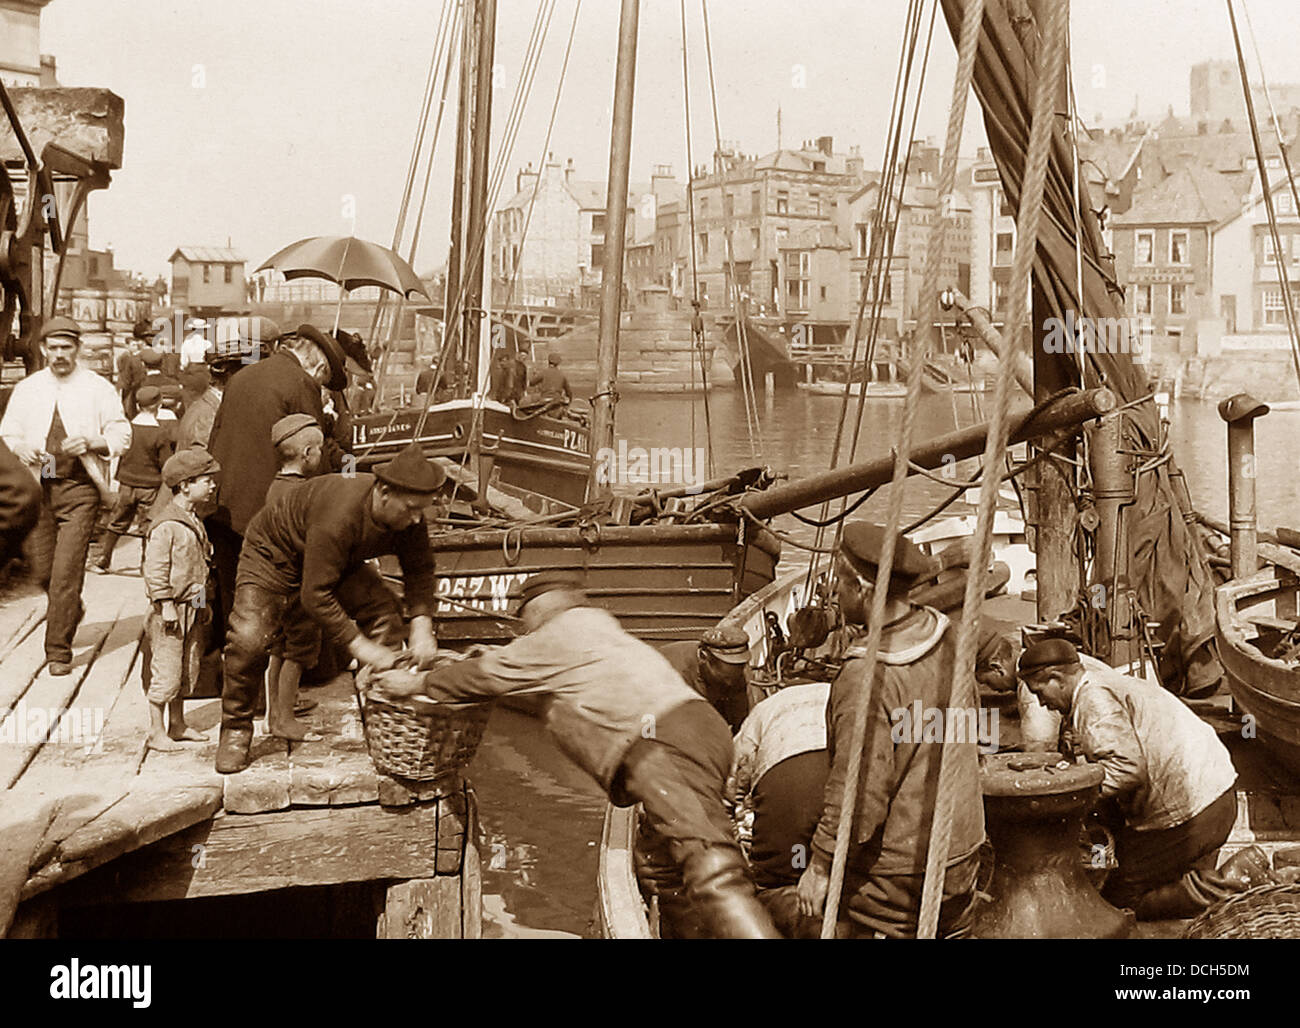 Fisherman Victorian Period Stock Photos Amp Fisherman Victorian Period Stock Images Alamy